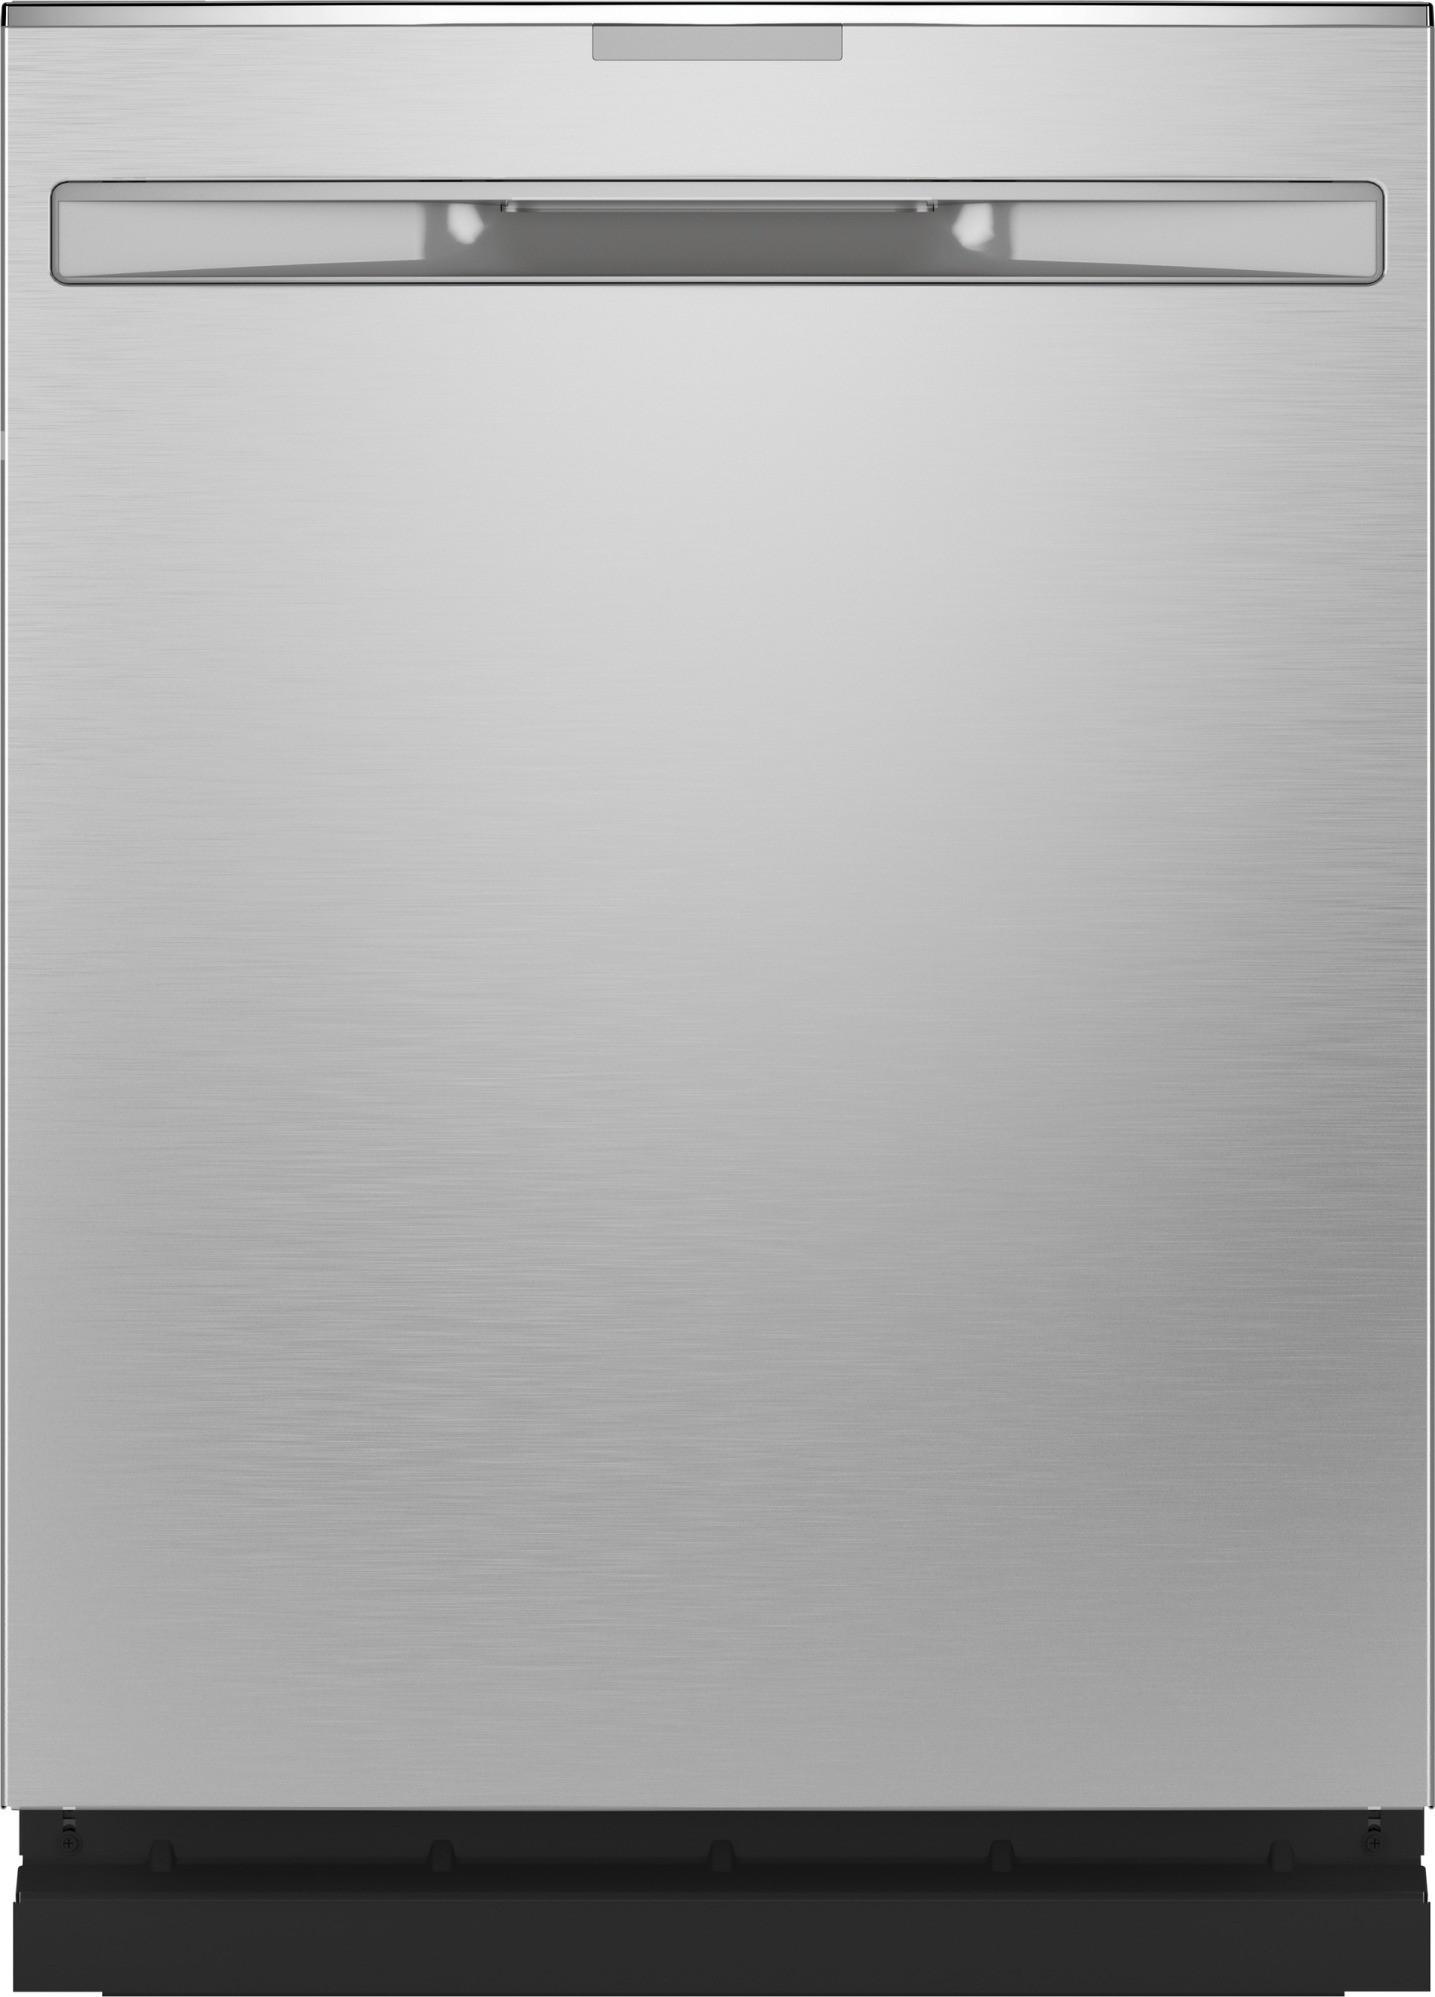 Ge Quiet Power 3 Dishwasher Handbook Ge Profile Pdp715synfs 24 Inch Dishwasher 45 Db Stainless Interior Stainless Steel Of Ge Quiet Power 3 Dishwasher Handbook